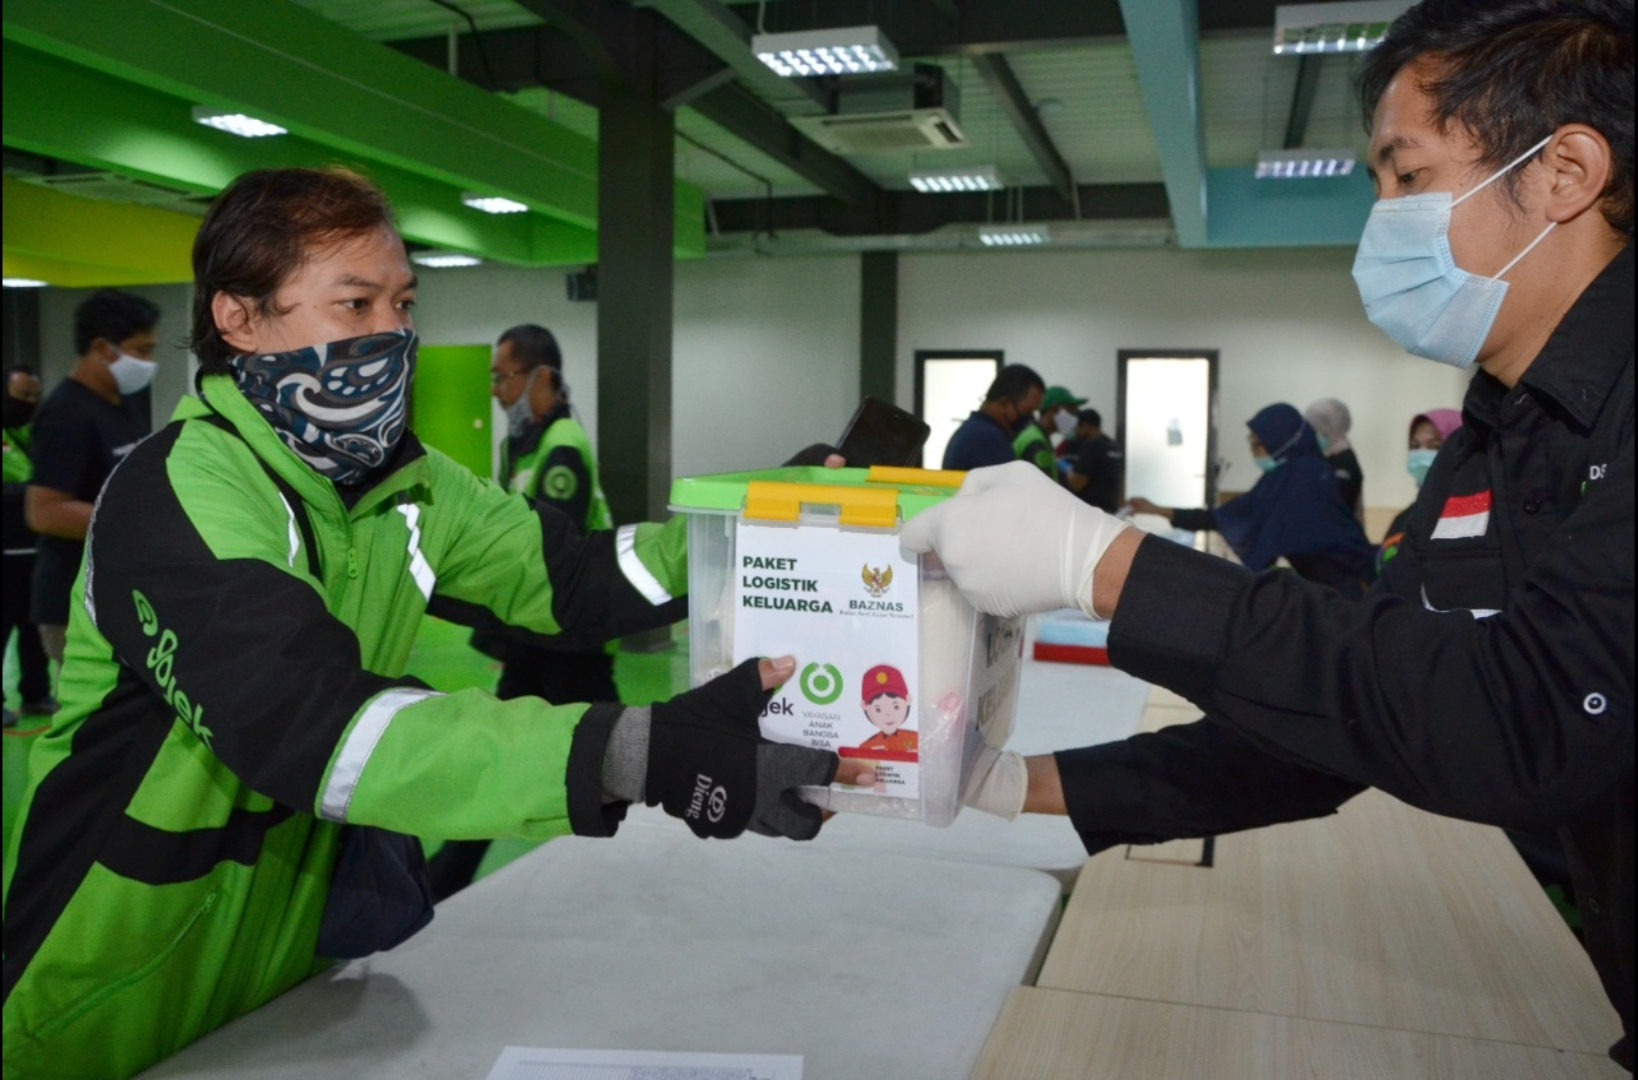 Pelanggan Gojek Donasi 1200 Paket Logistik Keluarga melalui BAZNAS